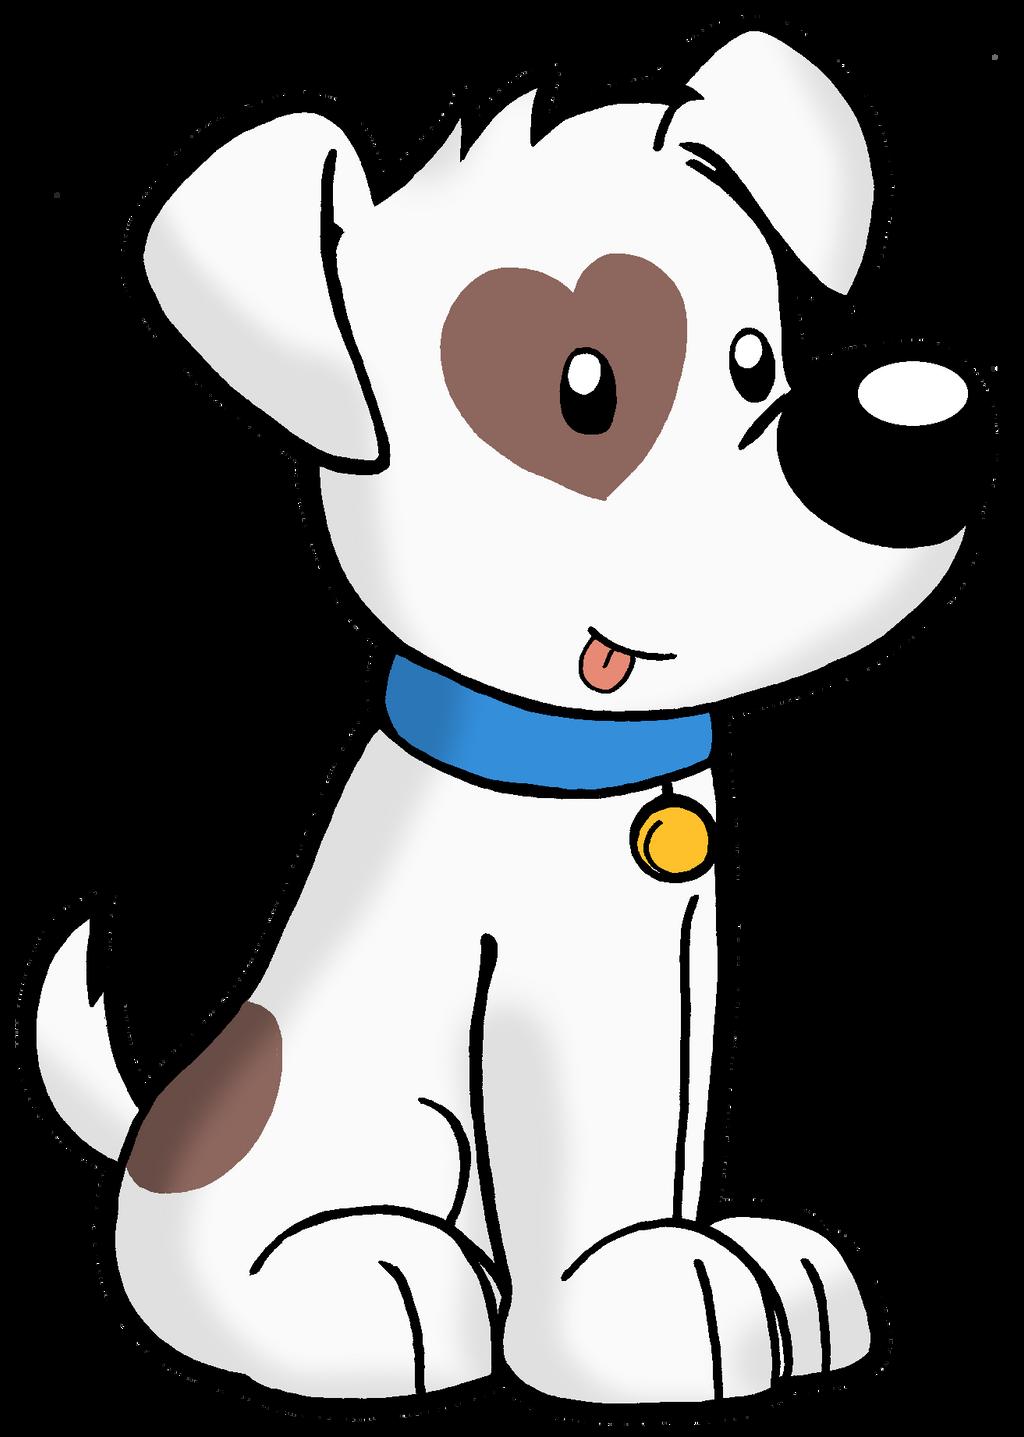 Lovin Oven Dog by Cartcoon on DeviantArt